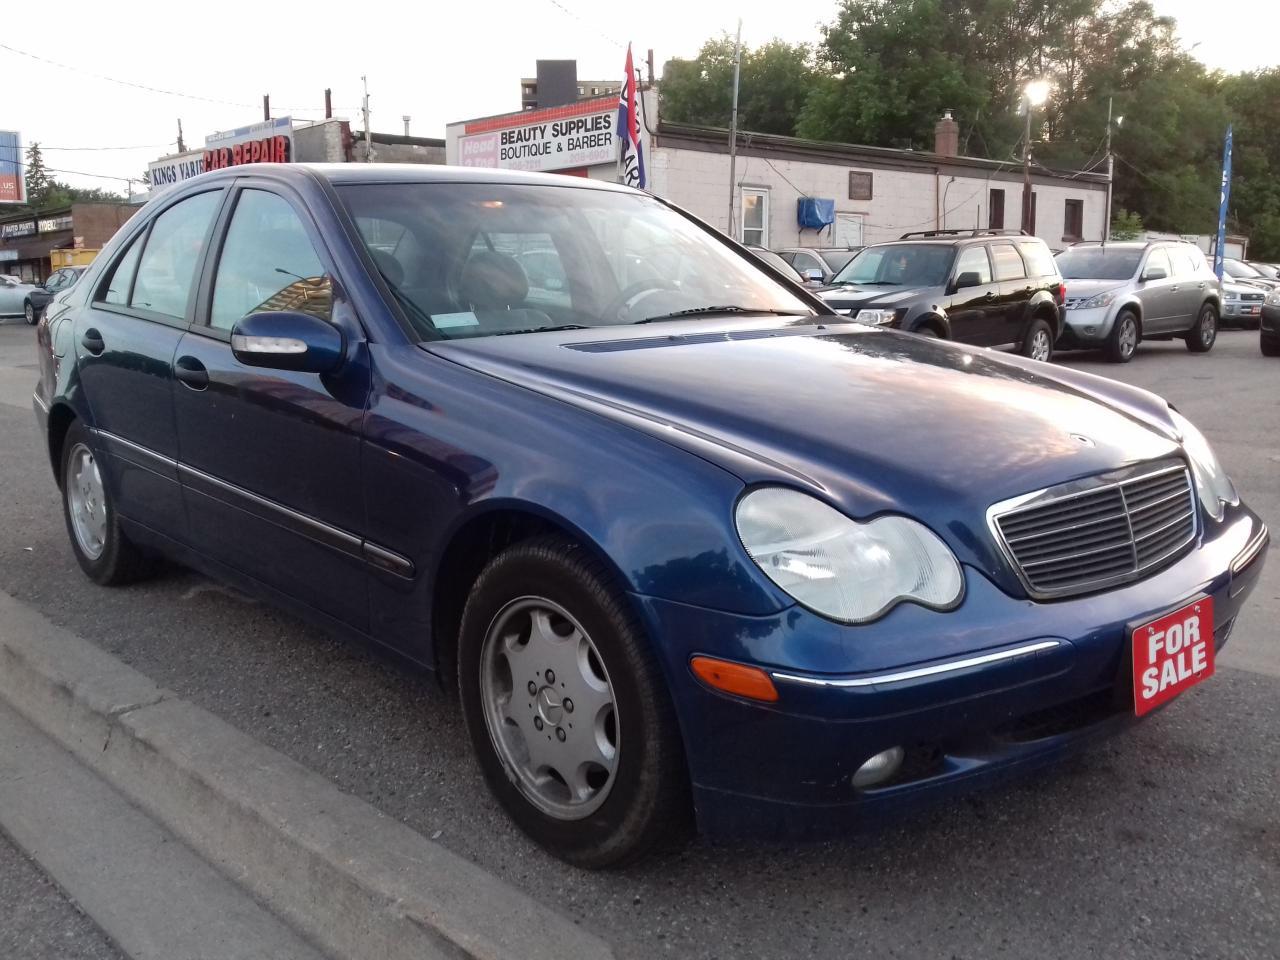 2003 Mercedes-Benz C240 2.6L Classic - Low KM 130,737 / $3995